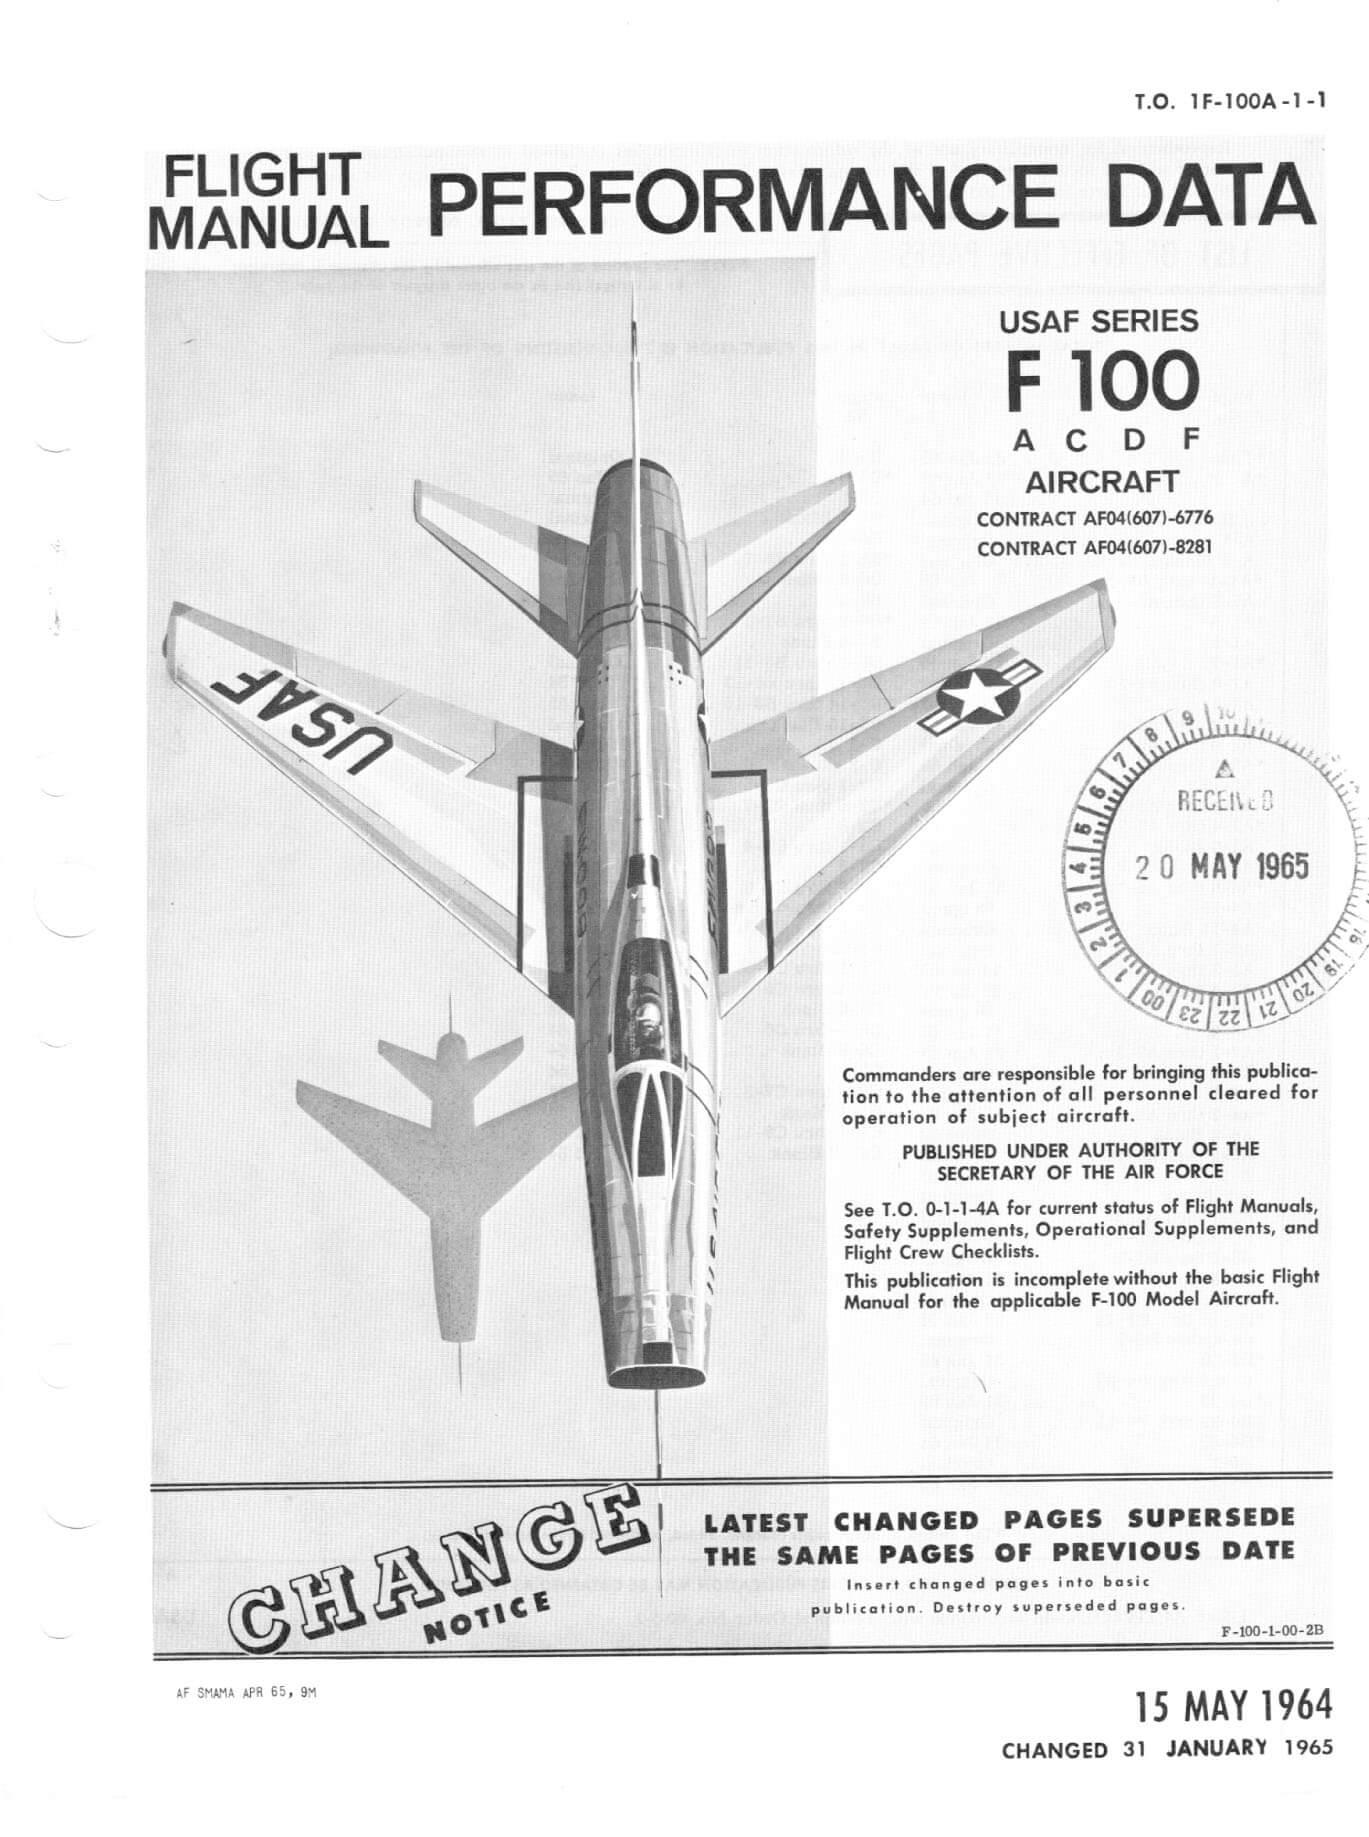 The F-100 rear pilot instrument panel